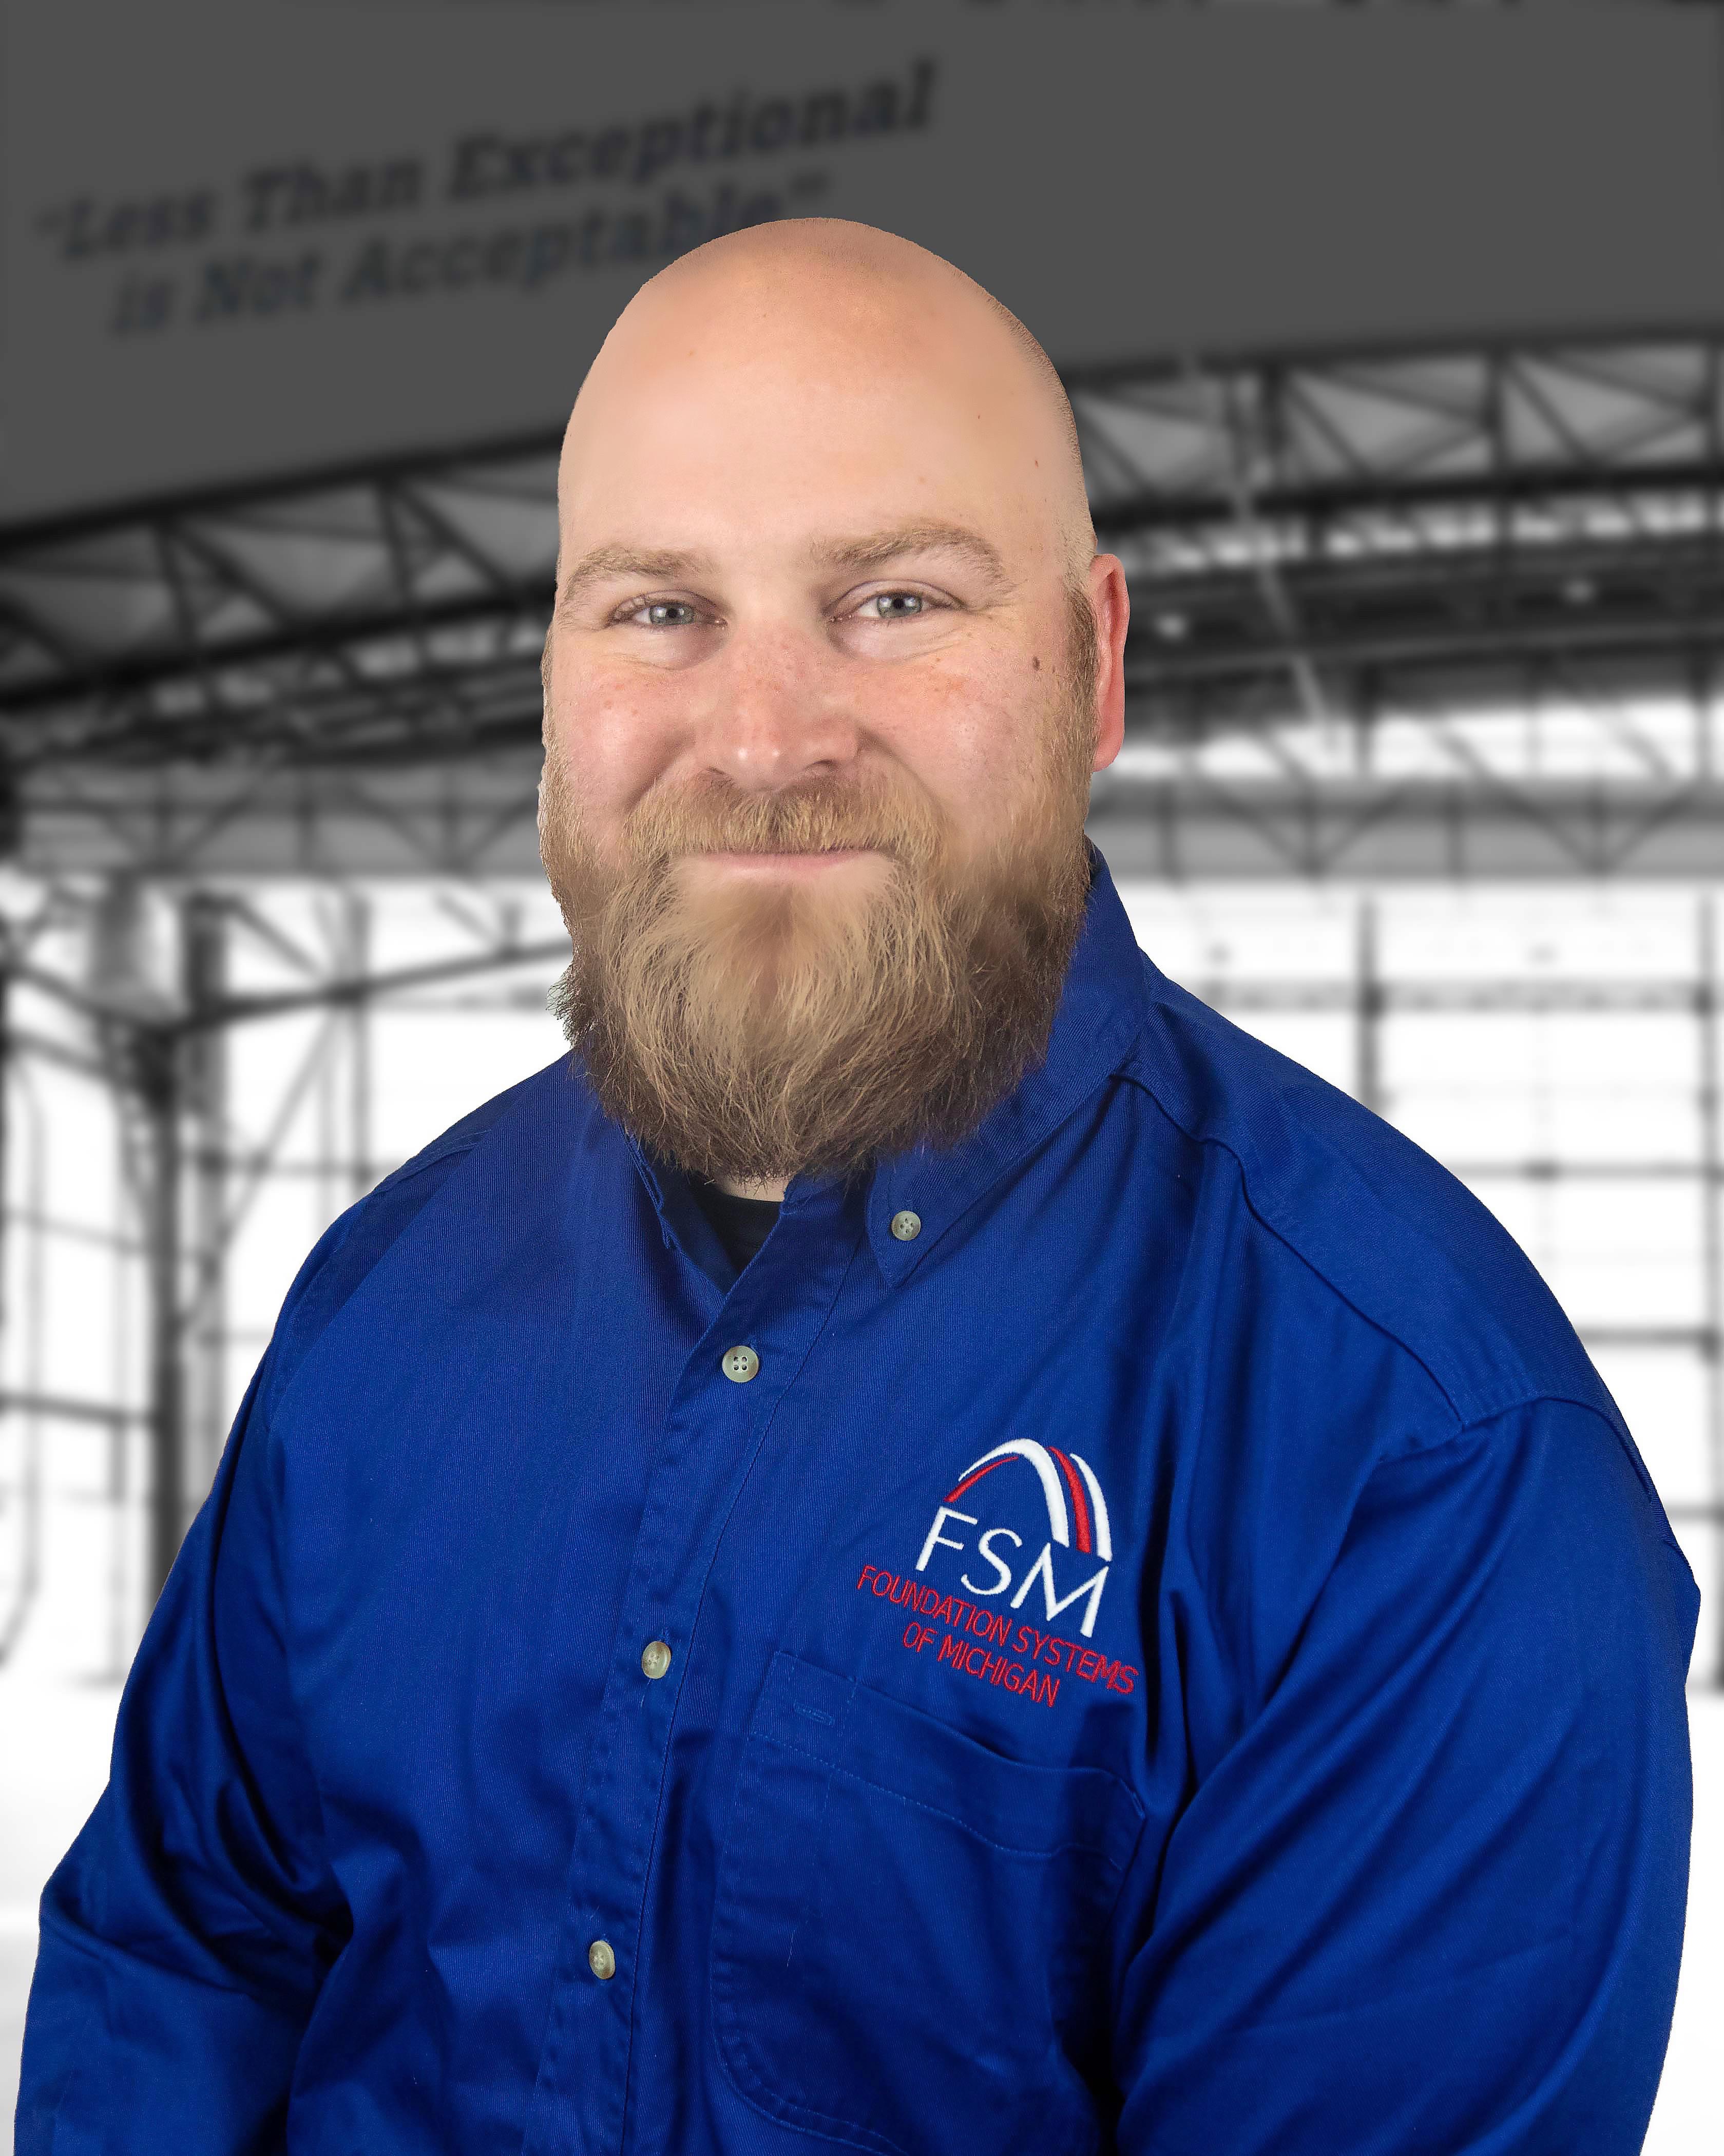 FSM Jeff Matusicky Customer Experience Advocate